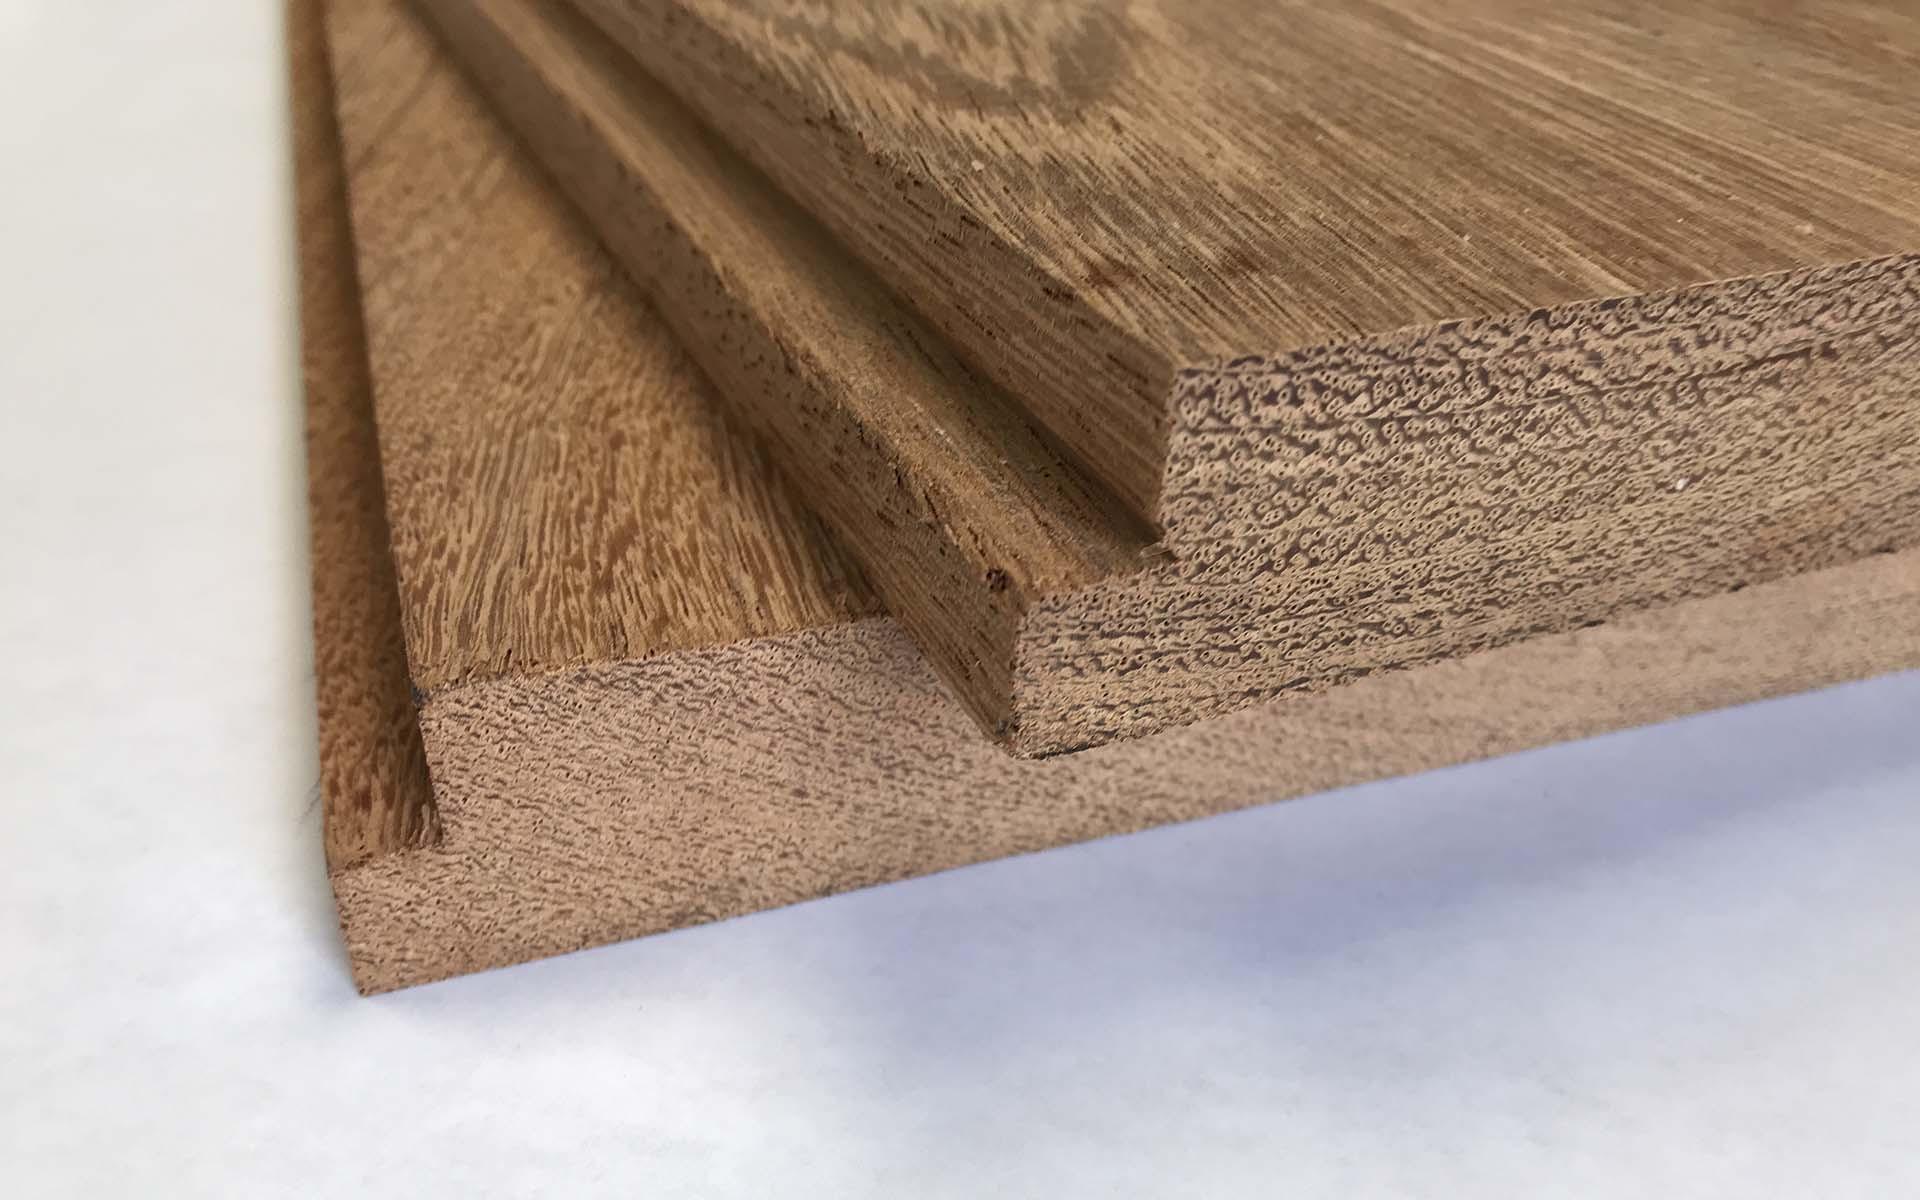 hardwood floor repair colorado springs of buy trailer decking apitong shiplap rough boards truck flooring pertaining to 3 angelim pedra shiplap close up